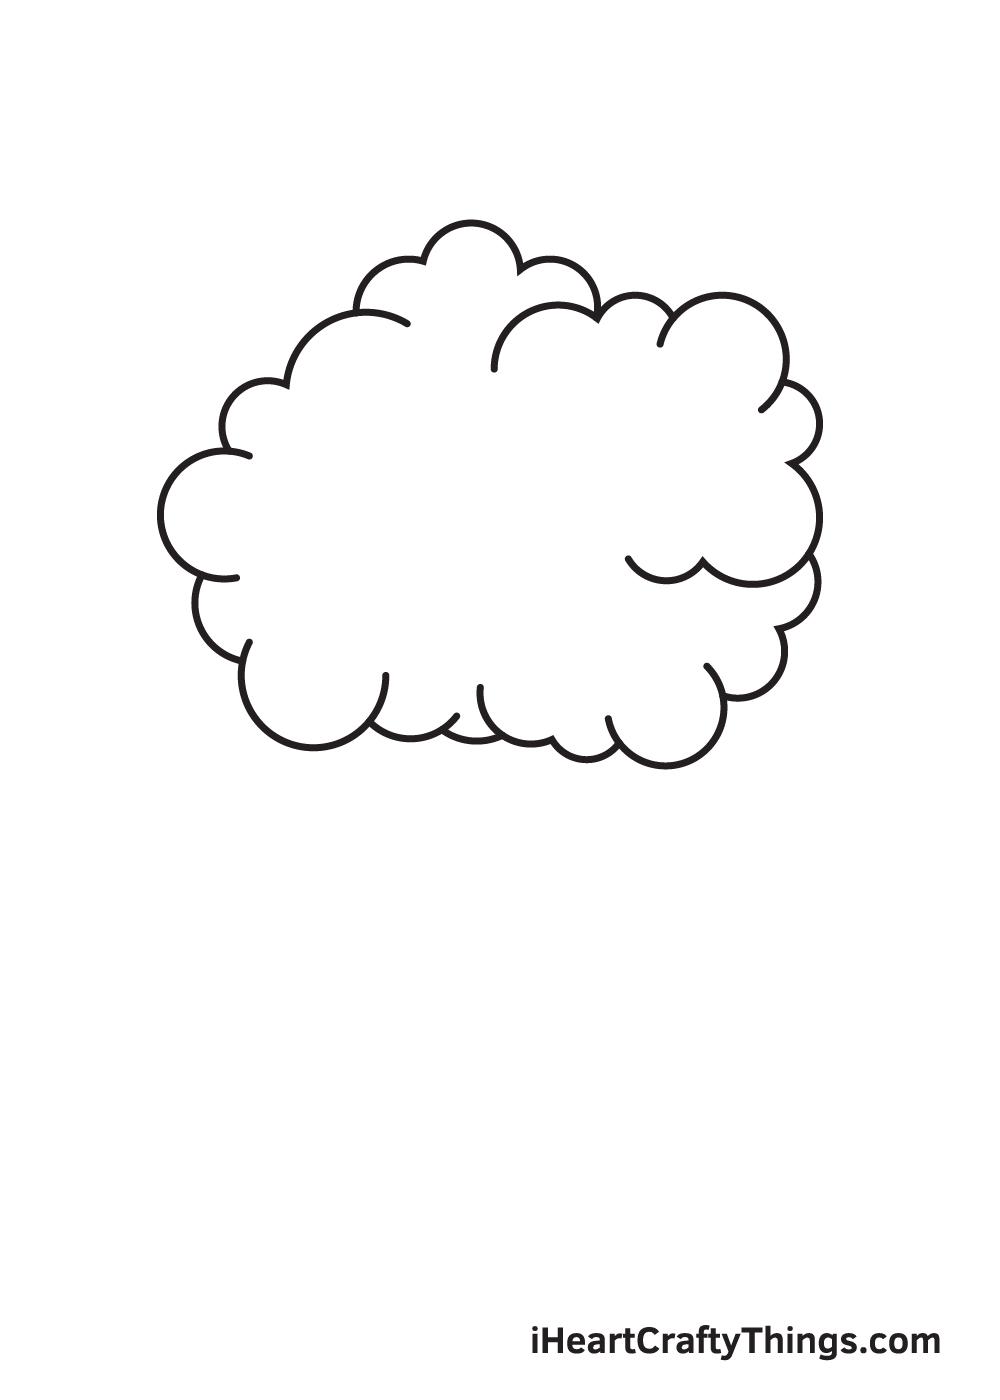 tree drawing step 8